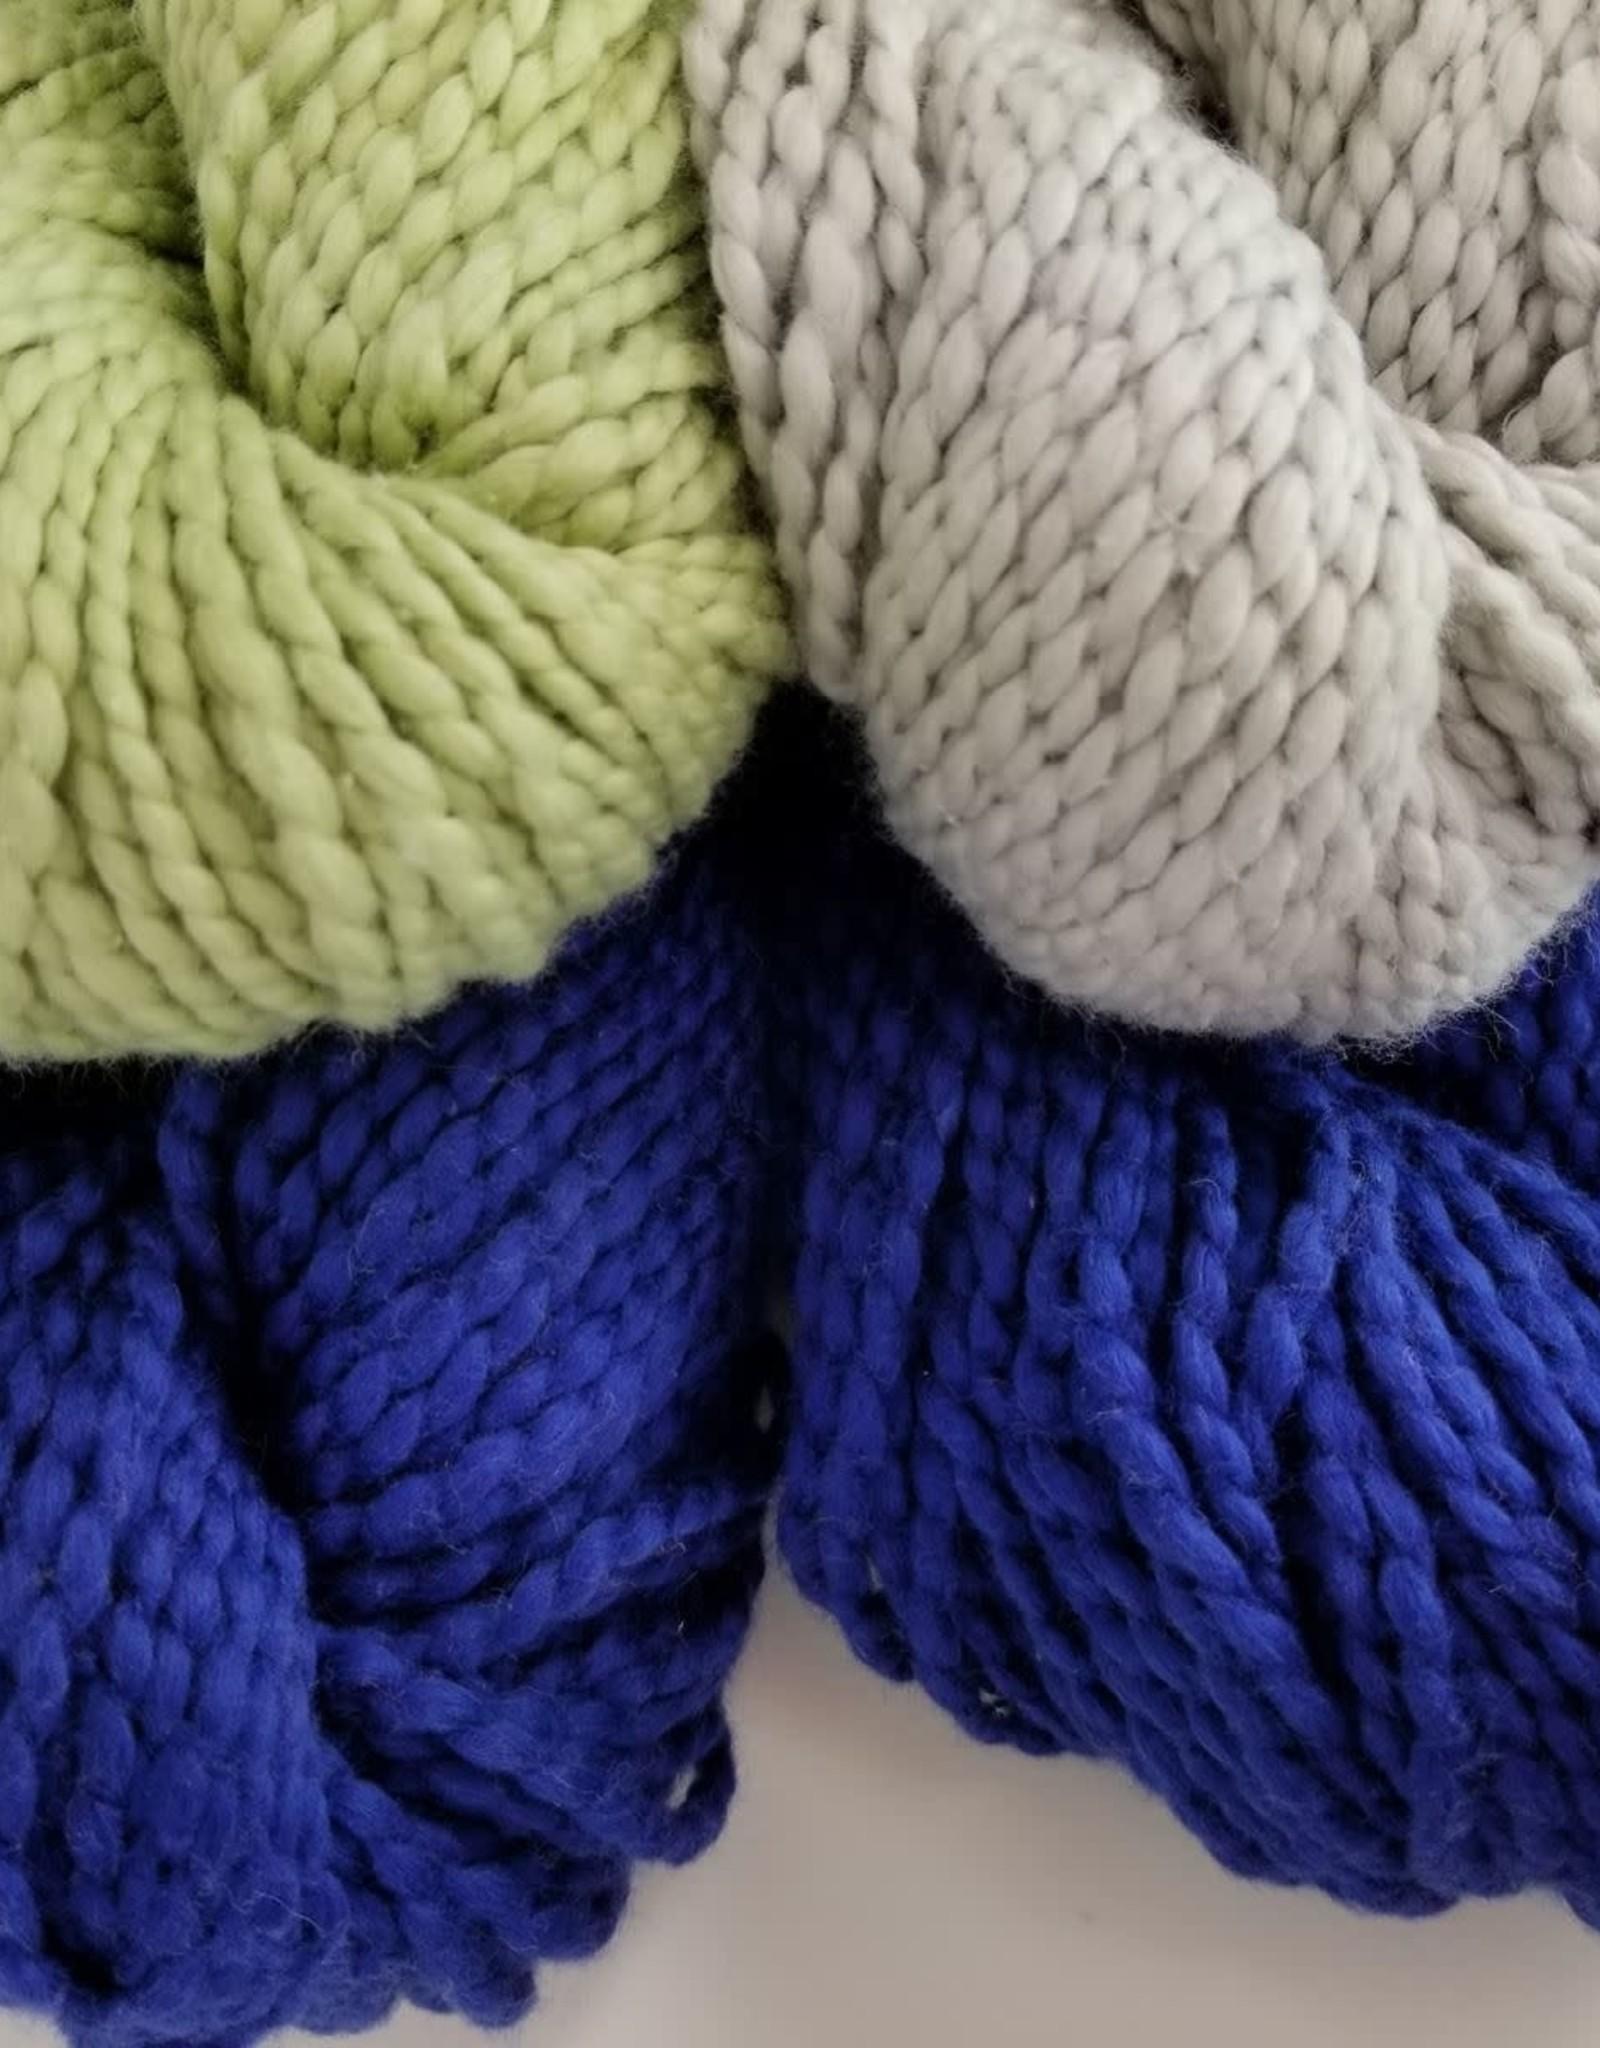 Plymouth Yarns KIT Cotton Bulky Baby Blanket navy/grn/grey 400g